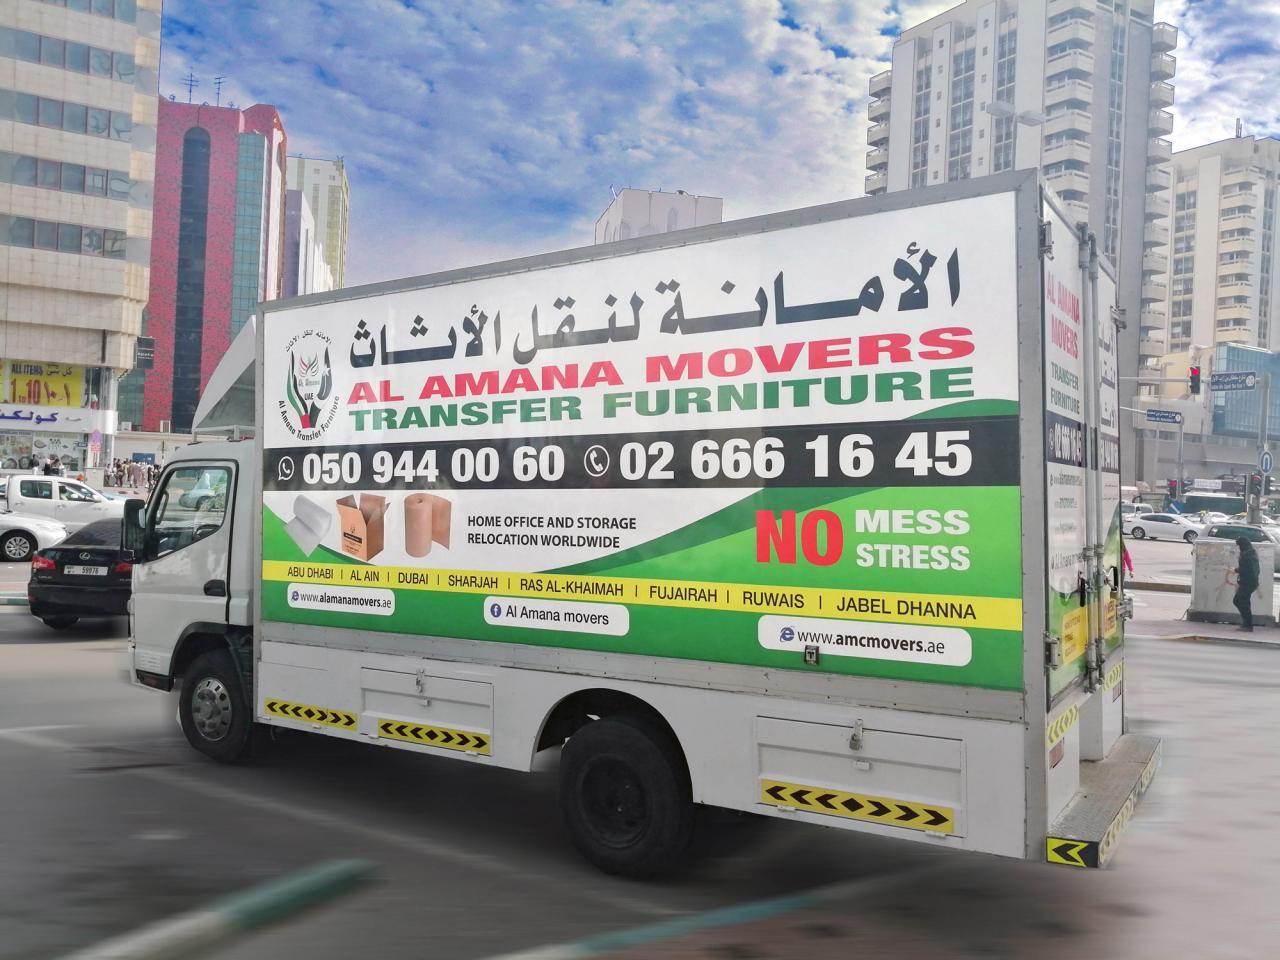 صورة ابوظبي نقل اثاث , اهم شركات نقل العفش